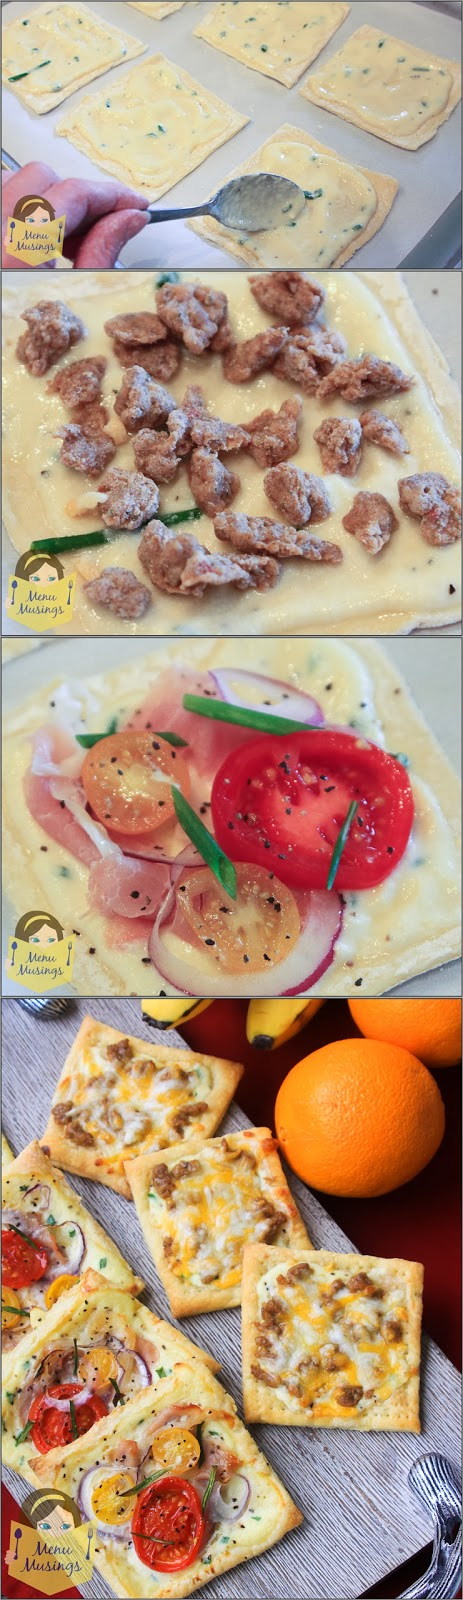 http://menumusings.blogspot.com/2014/02/puff-pastry-breakfast-pizzas.html